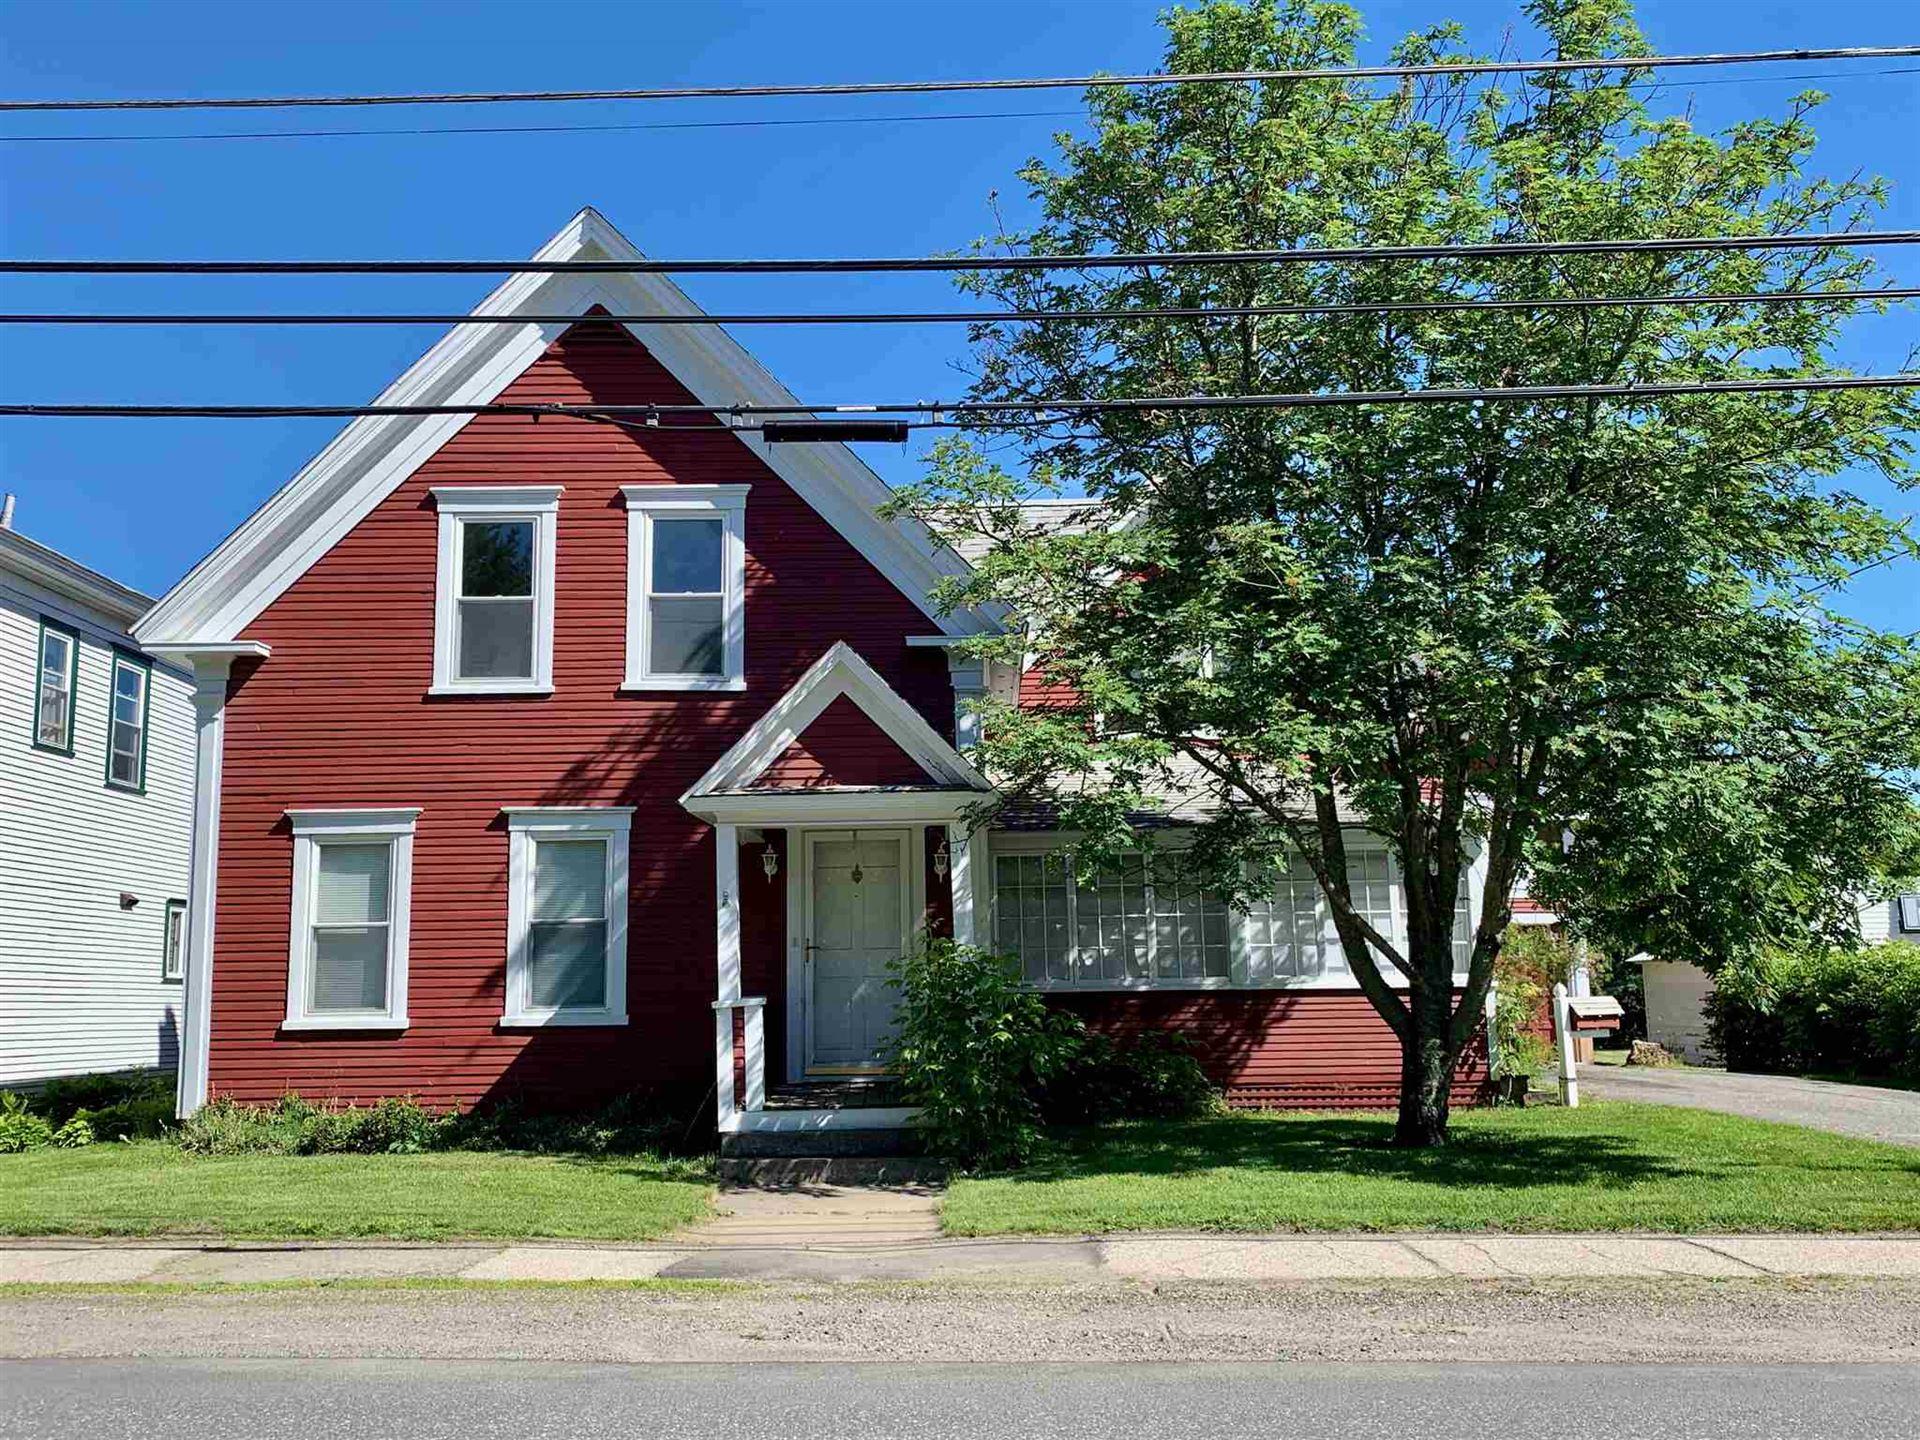 41 Park Street, Colebrook, NH 03576 - MLS#: 4811746